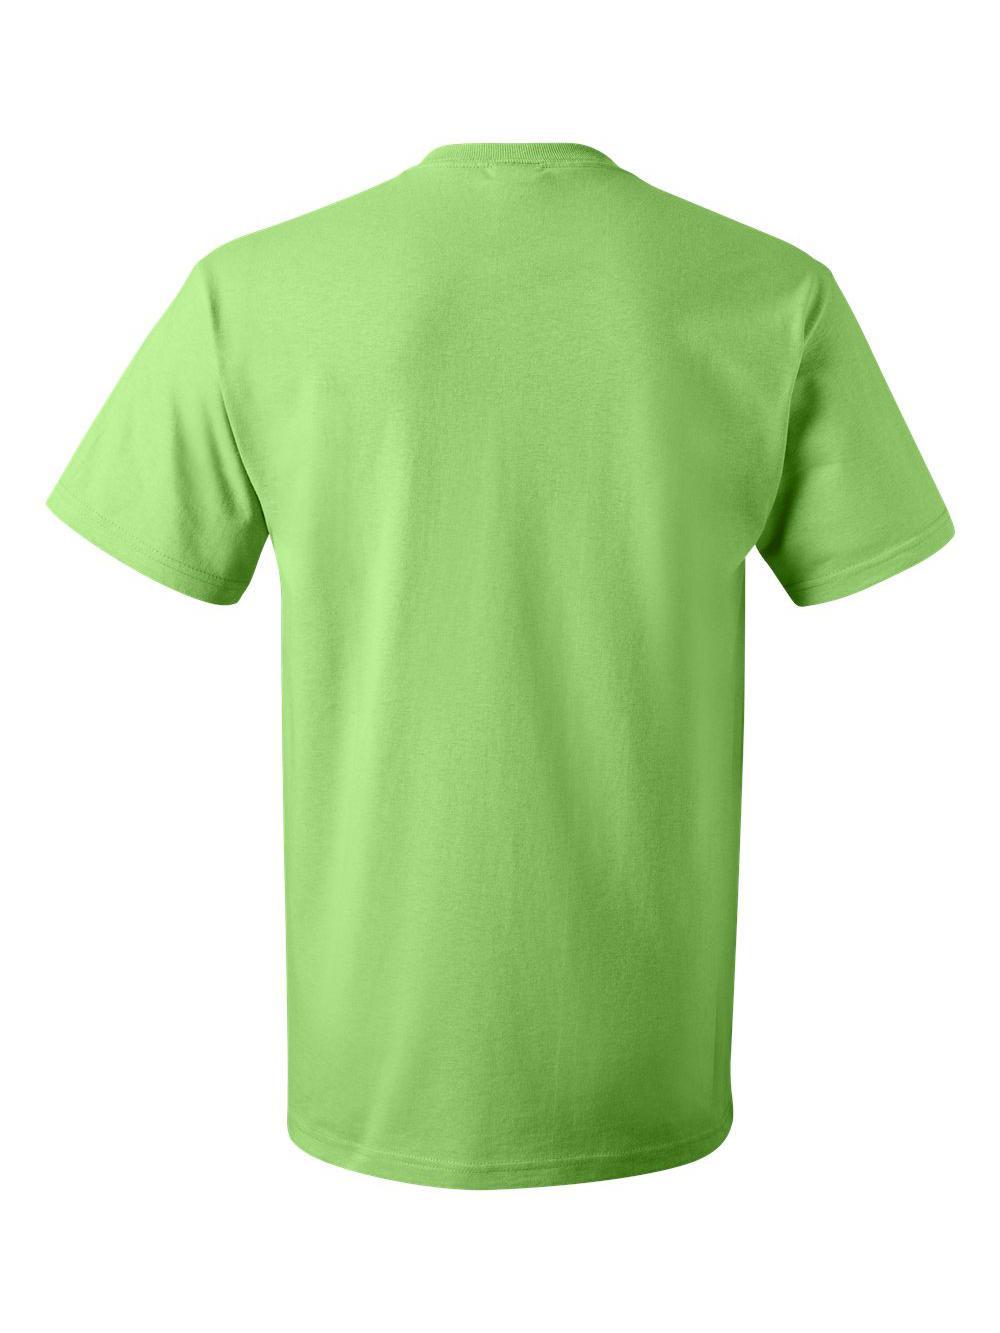 Fruit-of-the-Loom-HD-Cotton-Short-Sleeve-T-Shirt-3930R thumbnail 70